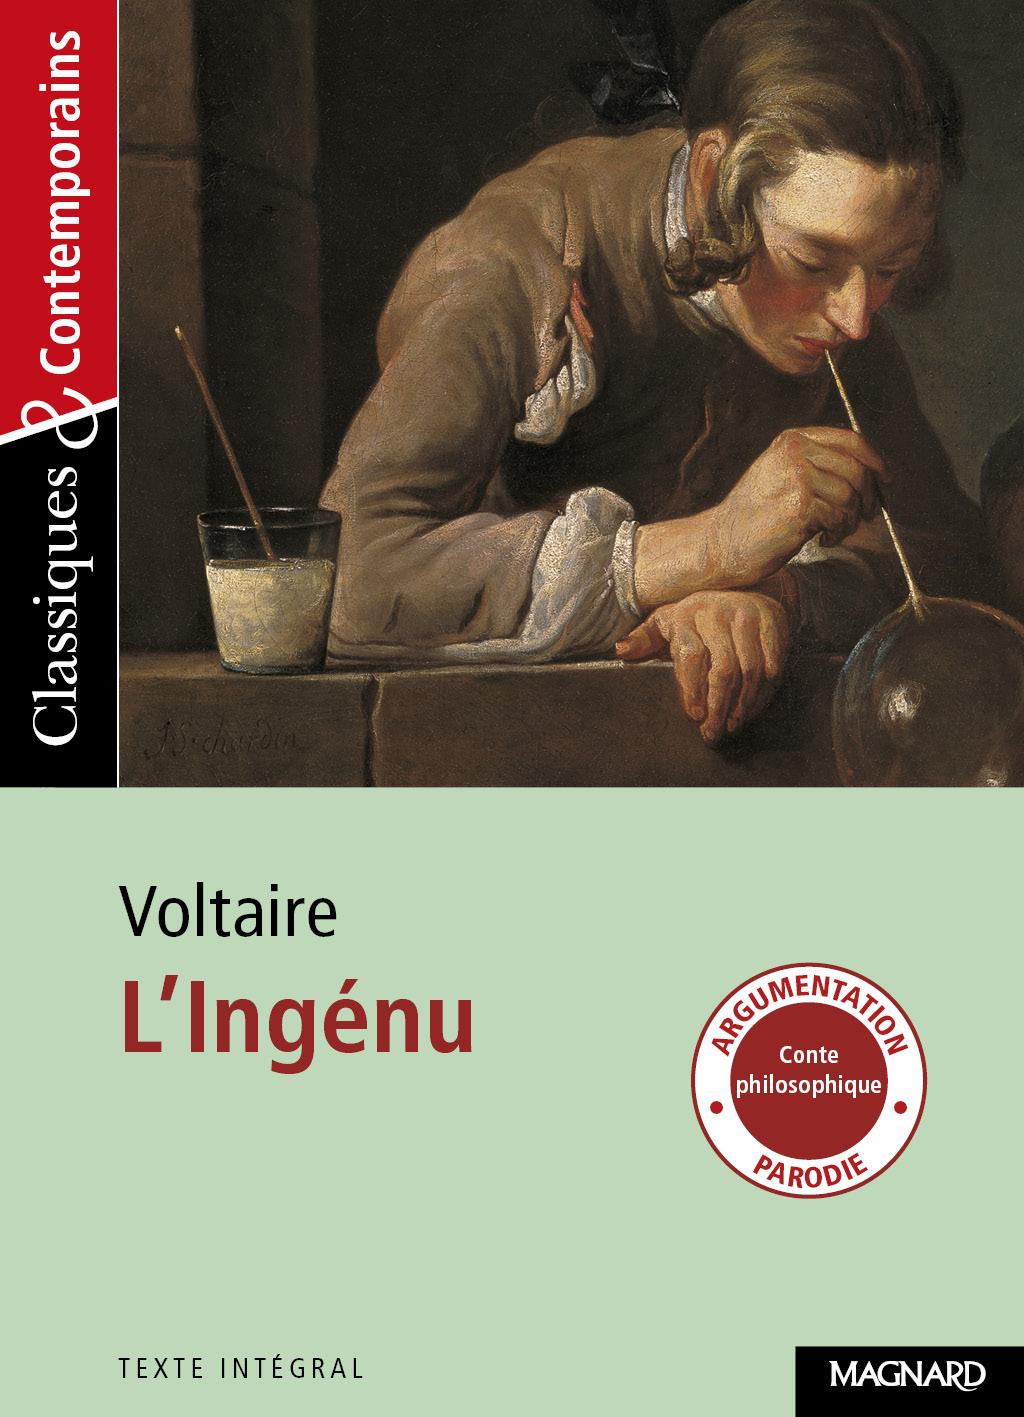 INGENU (L') (VOLTAIRE) N.48